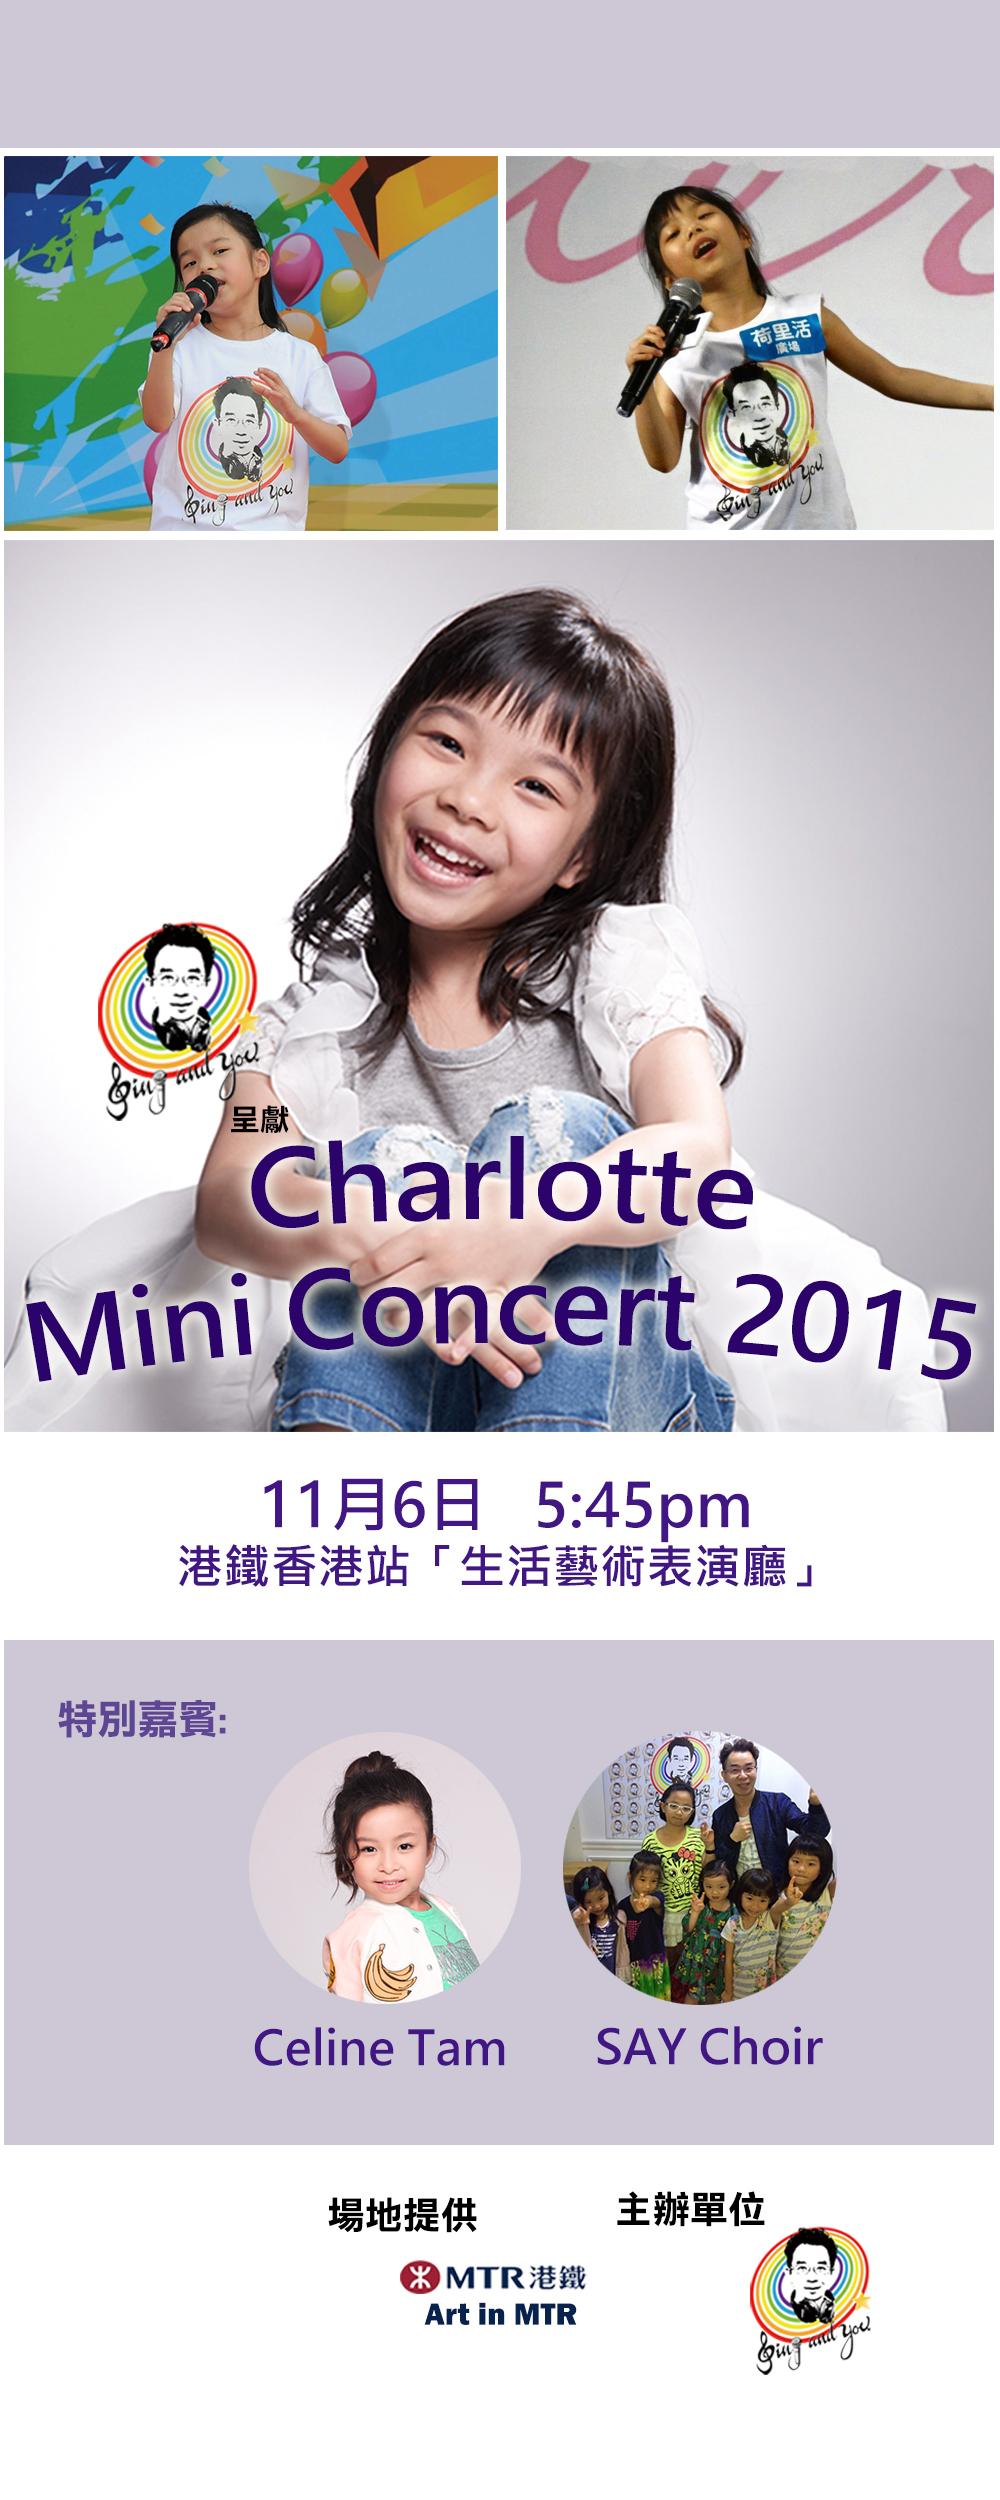 Charlotte Mini Concert